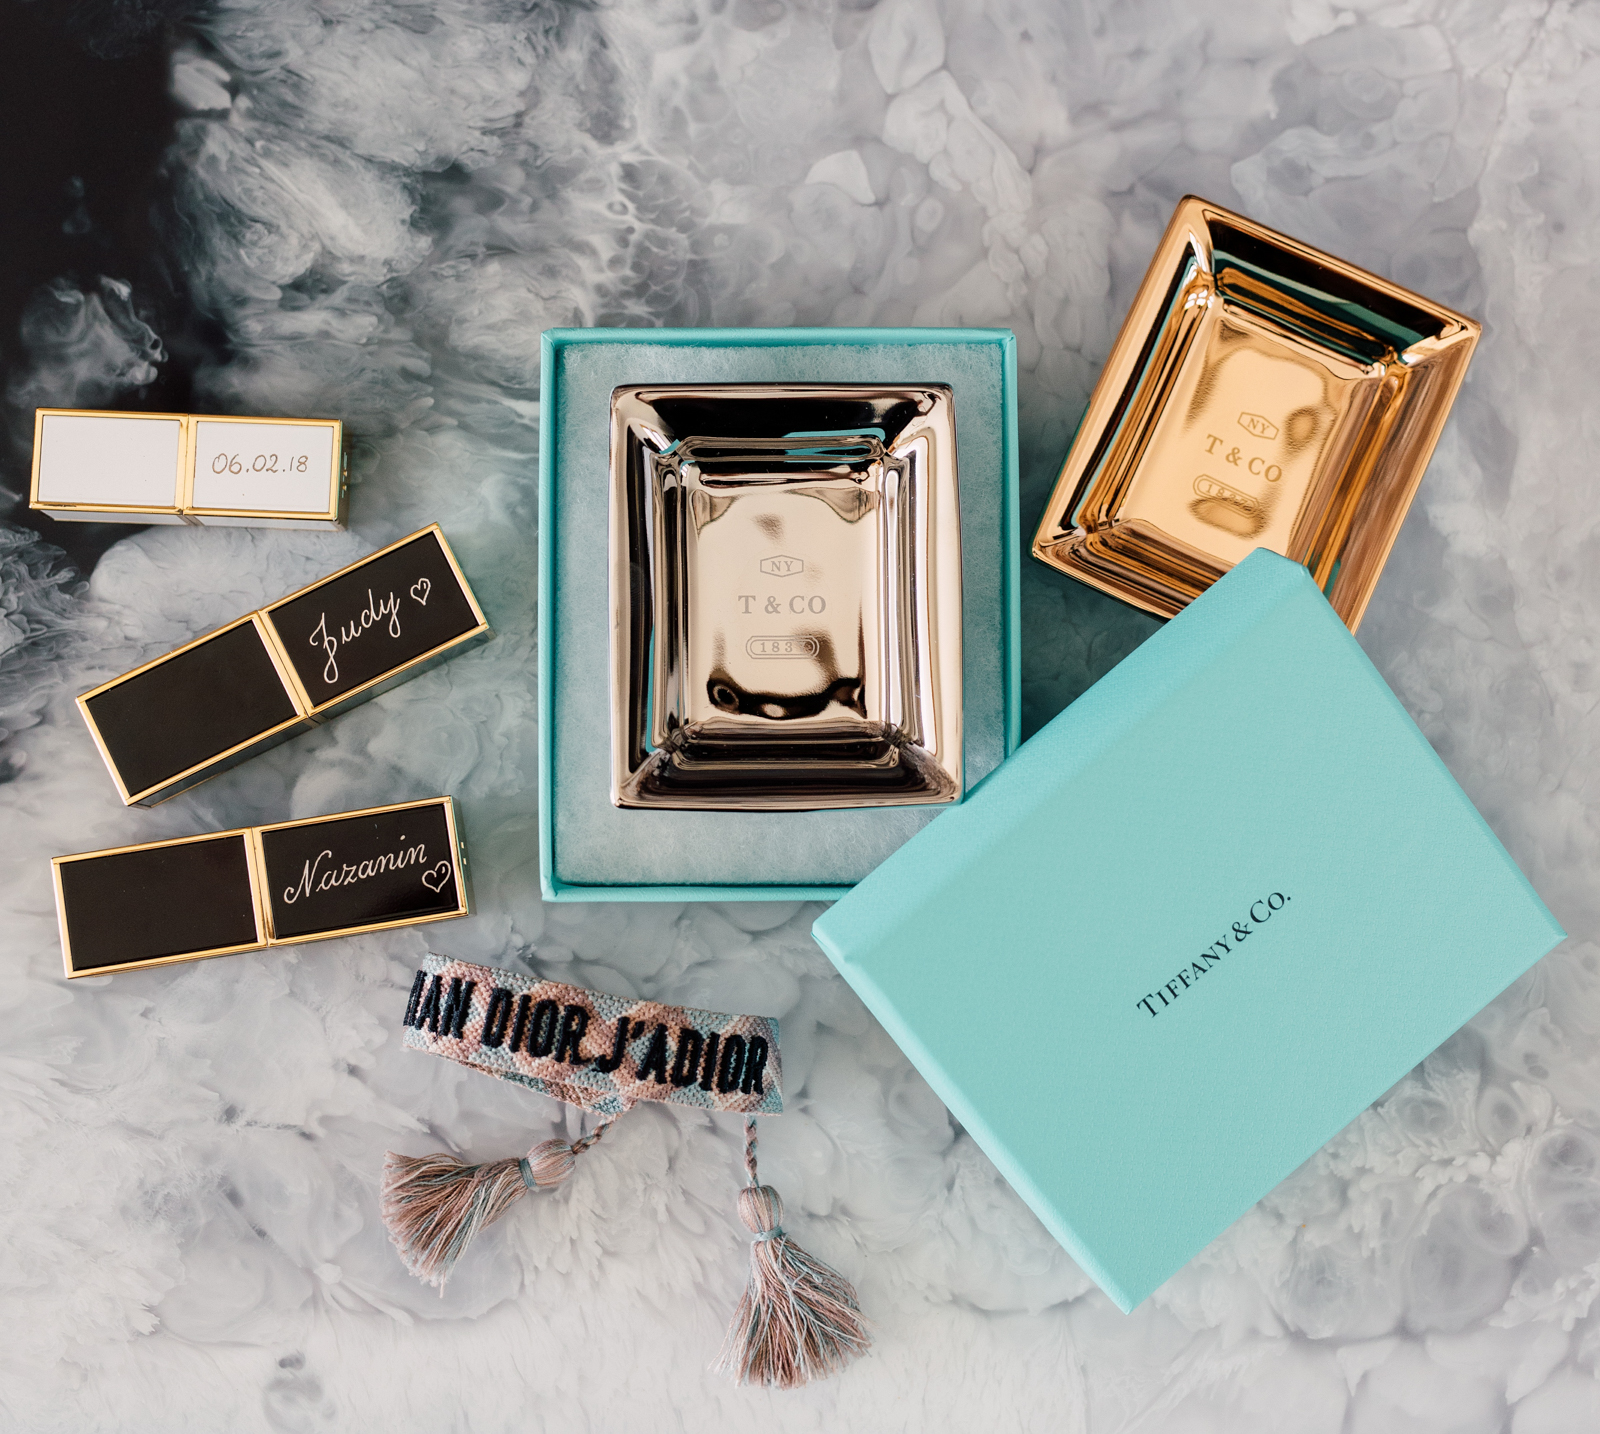 Tiffany & Co bridesmaid gift